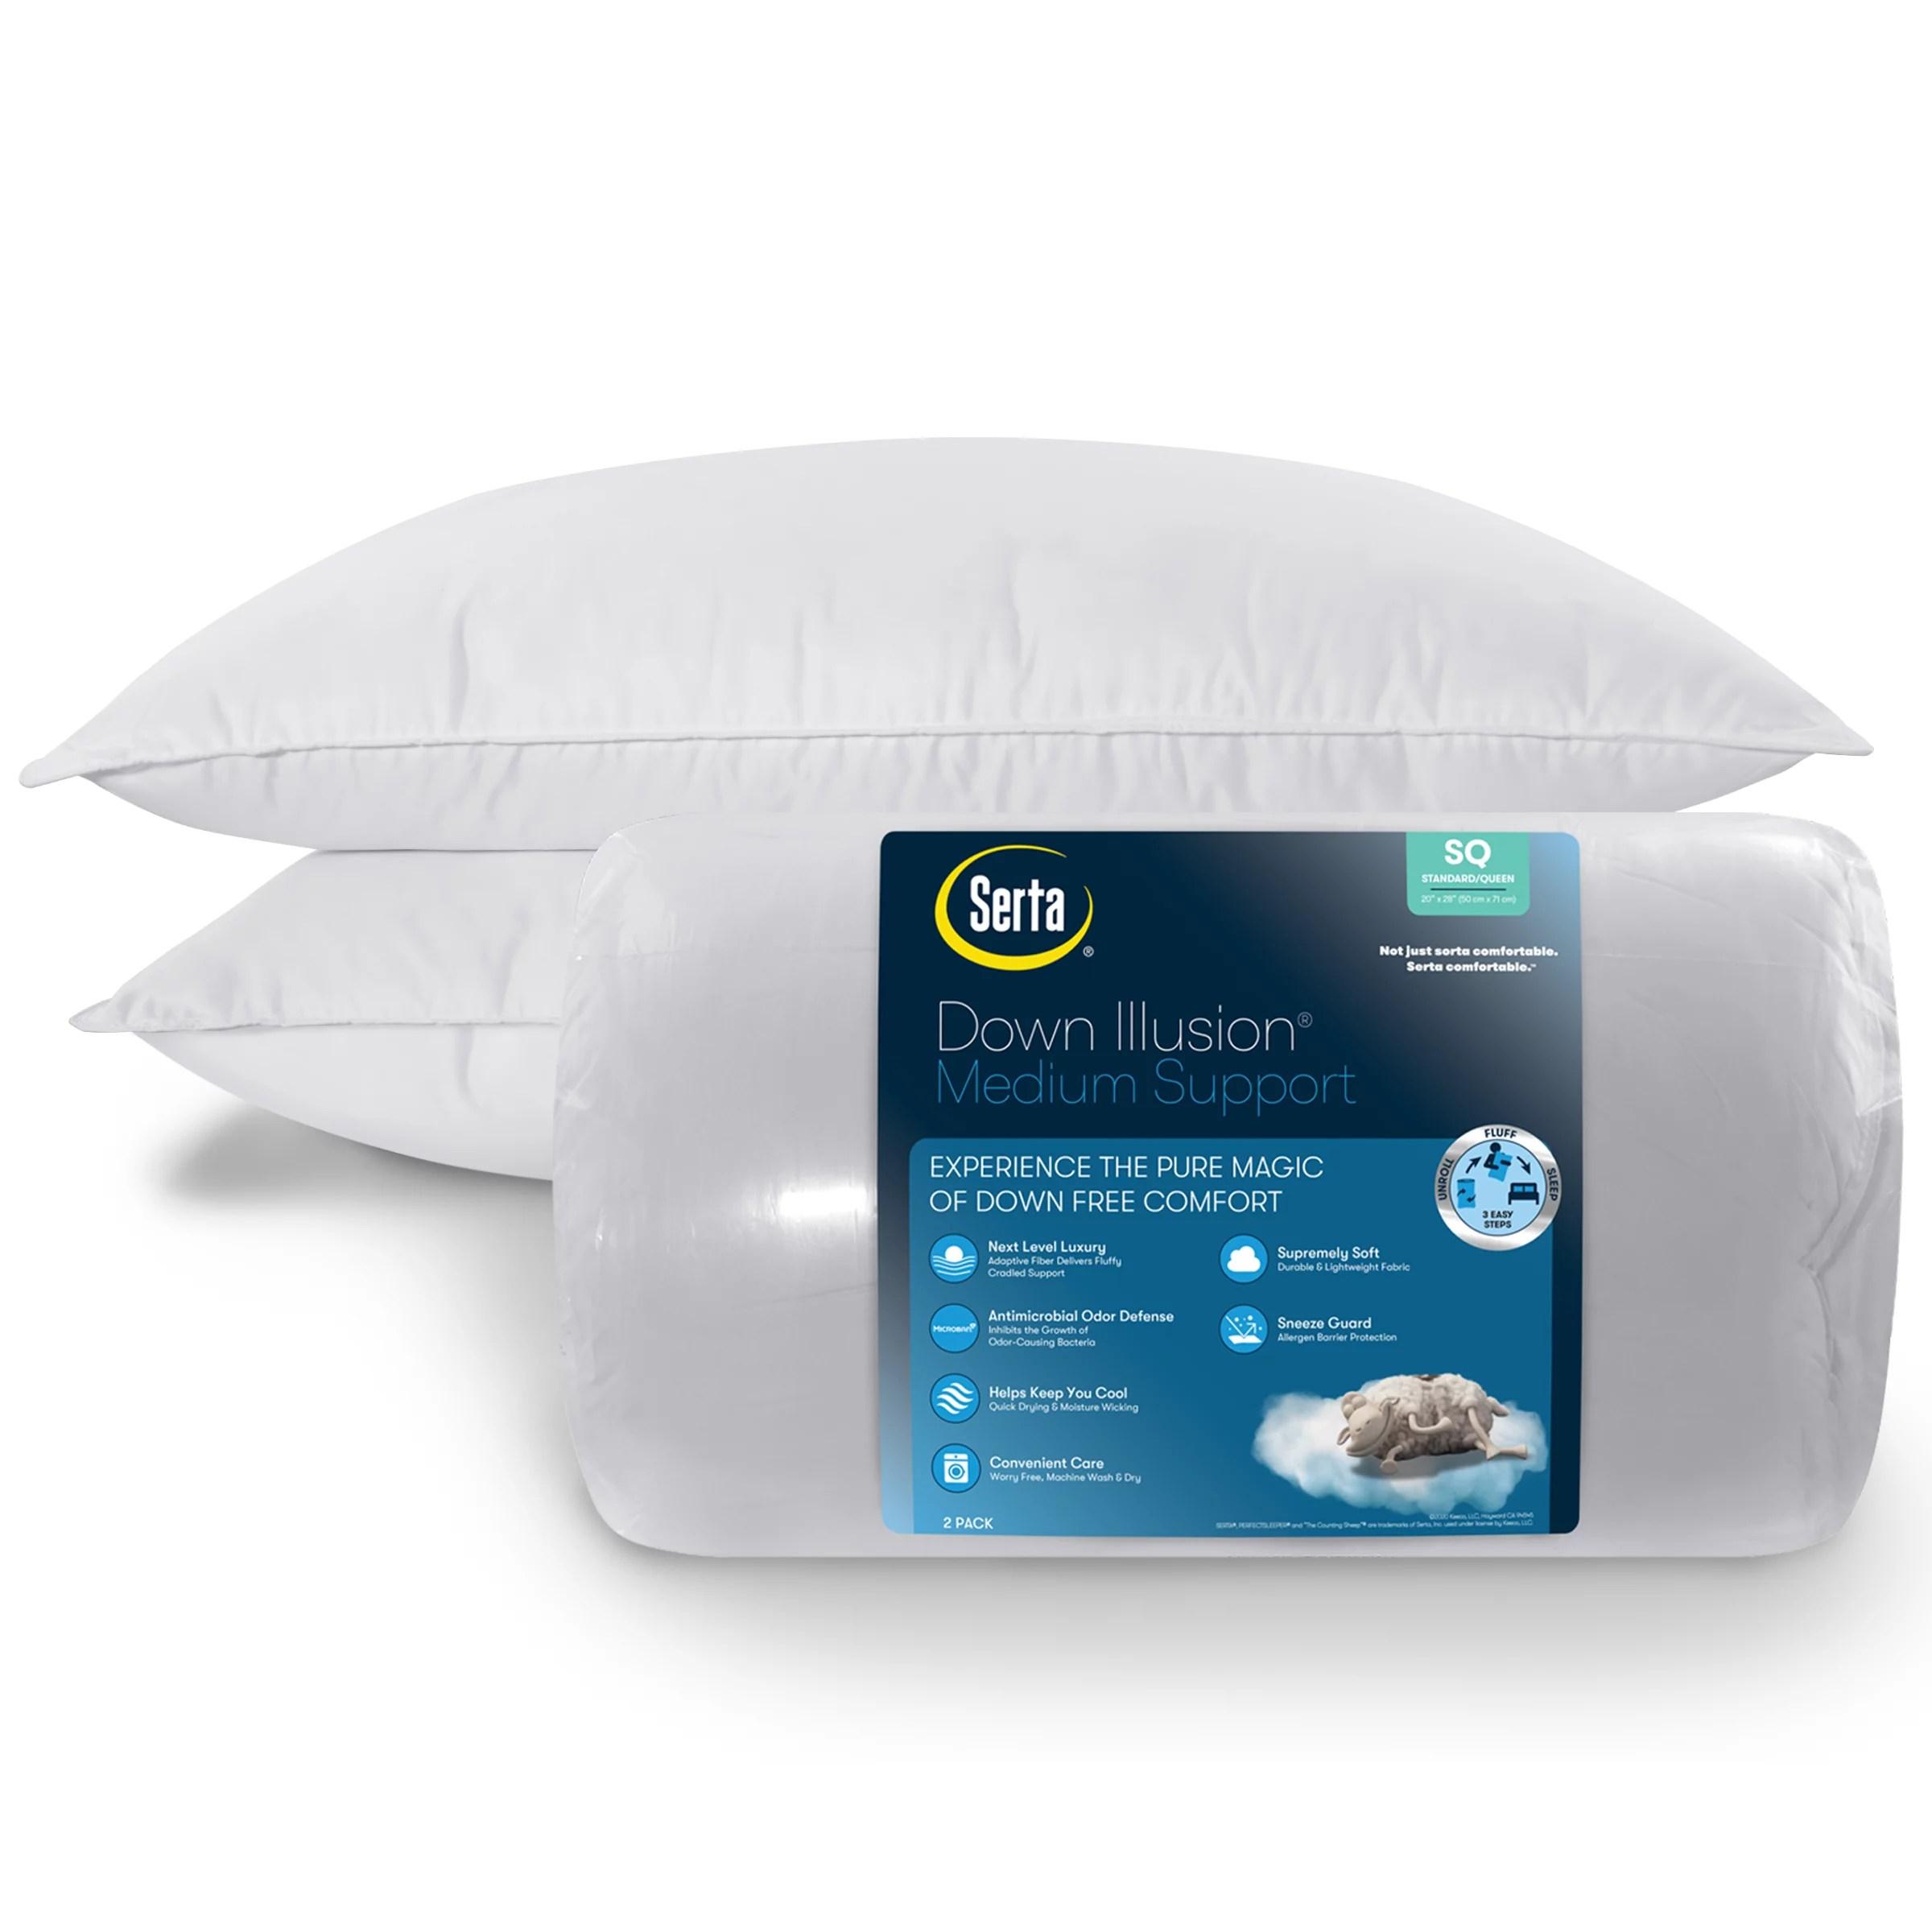 serta down illusion medium density pillow king 2 pack